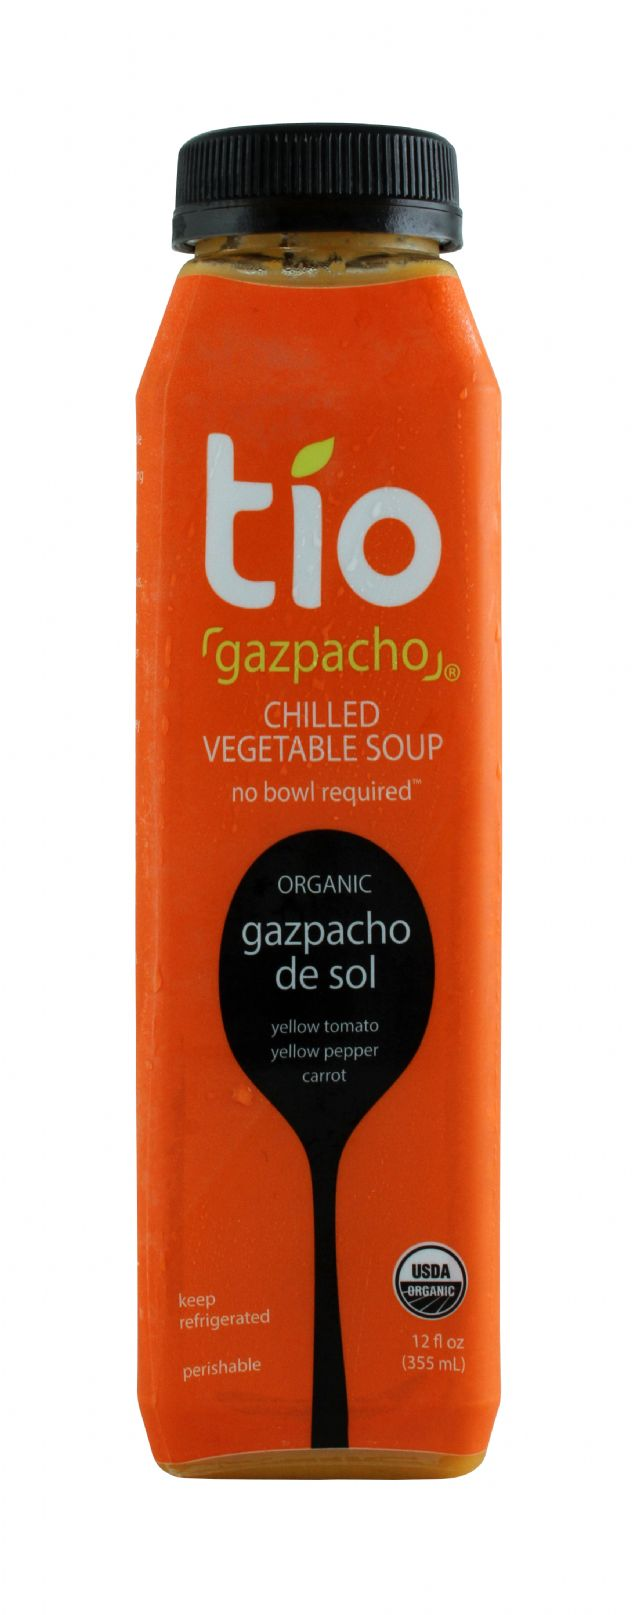 Tio Gazpacho: Tio Sol Front